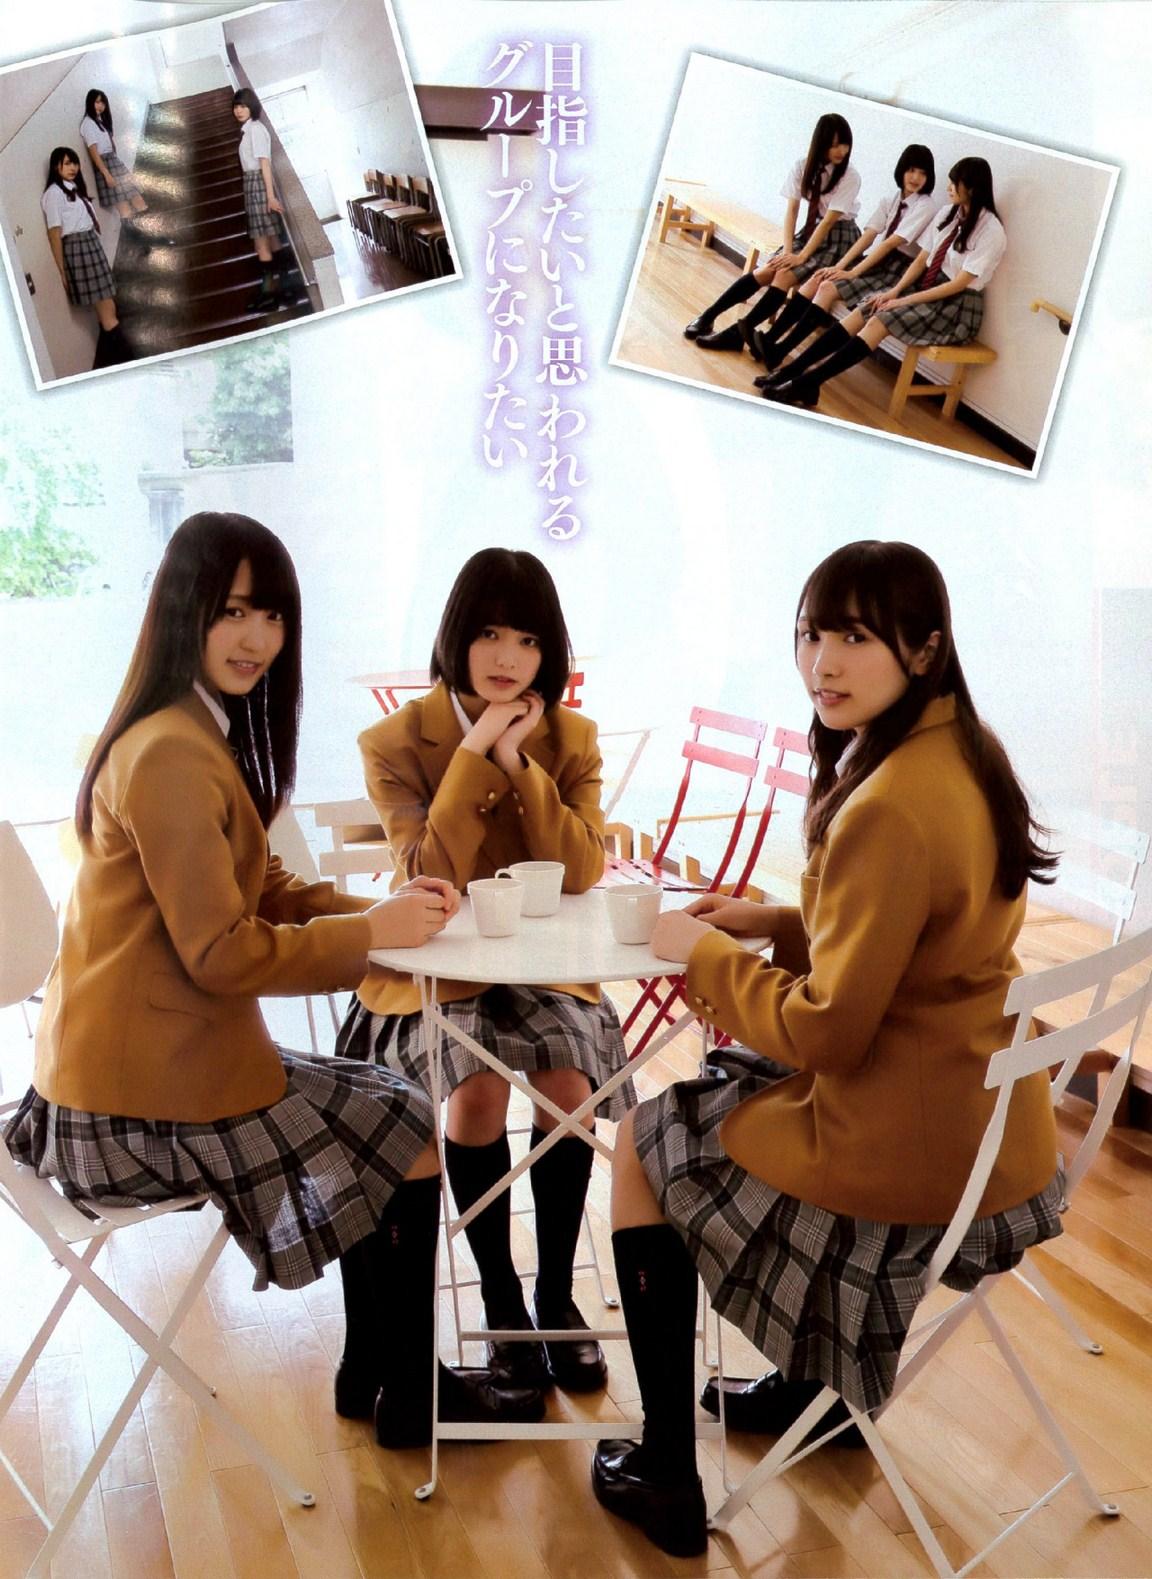 Watanabe Rika 渡辺梨加, Hirate Yurina 平手友梨奈, Sugai Yuuka 菅井友香 Keyakizaka46, Weekly SPA! Magazine 2016.06.07 Gravure